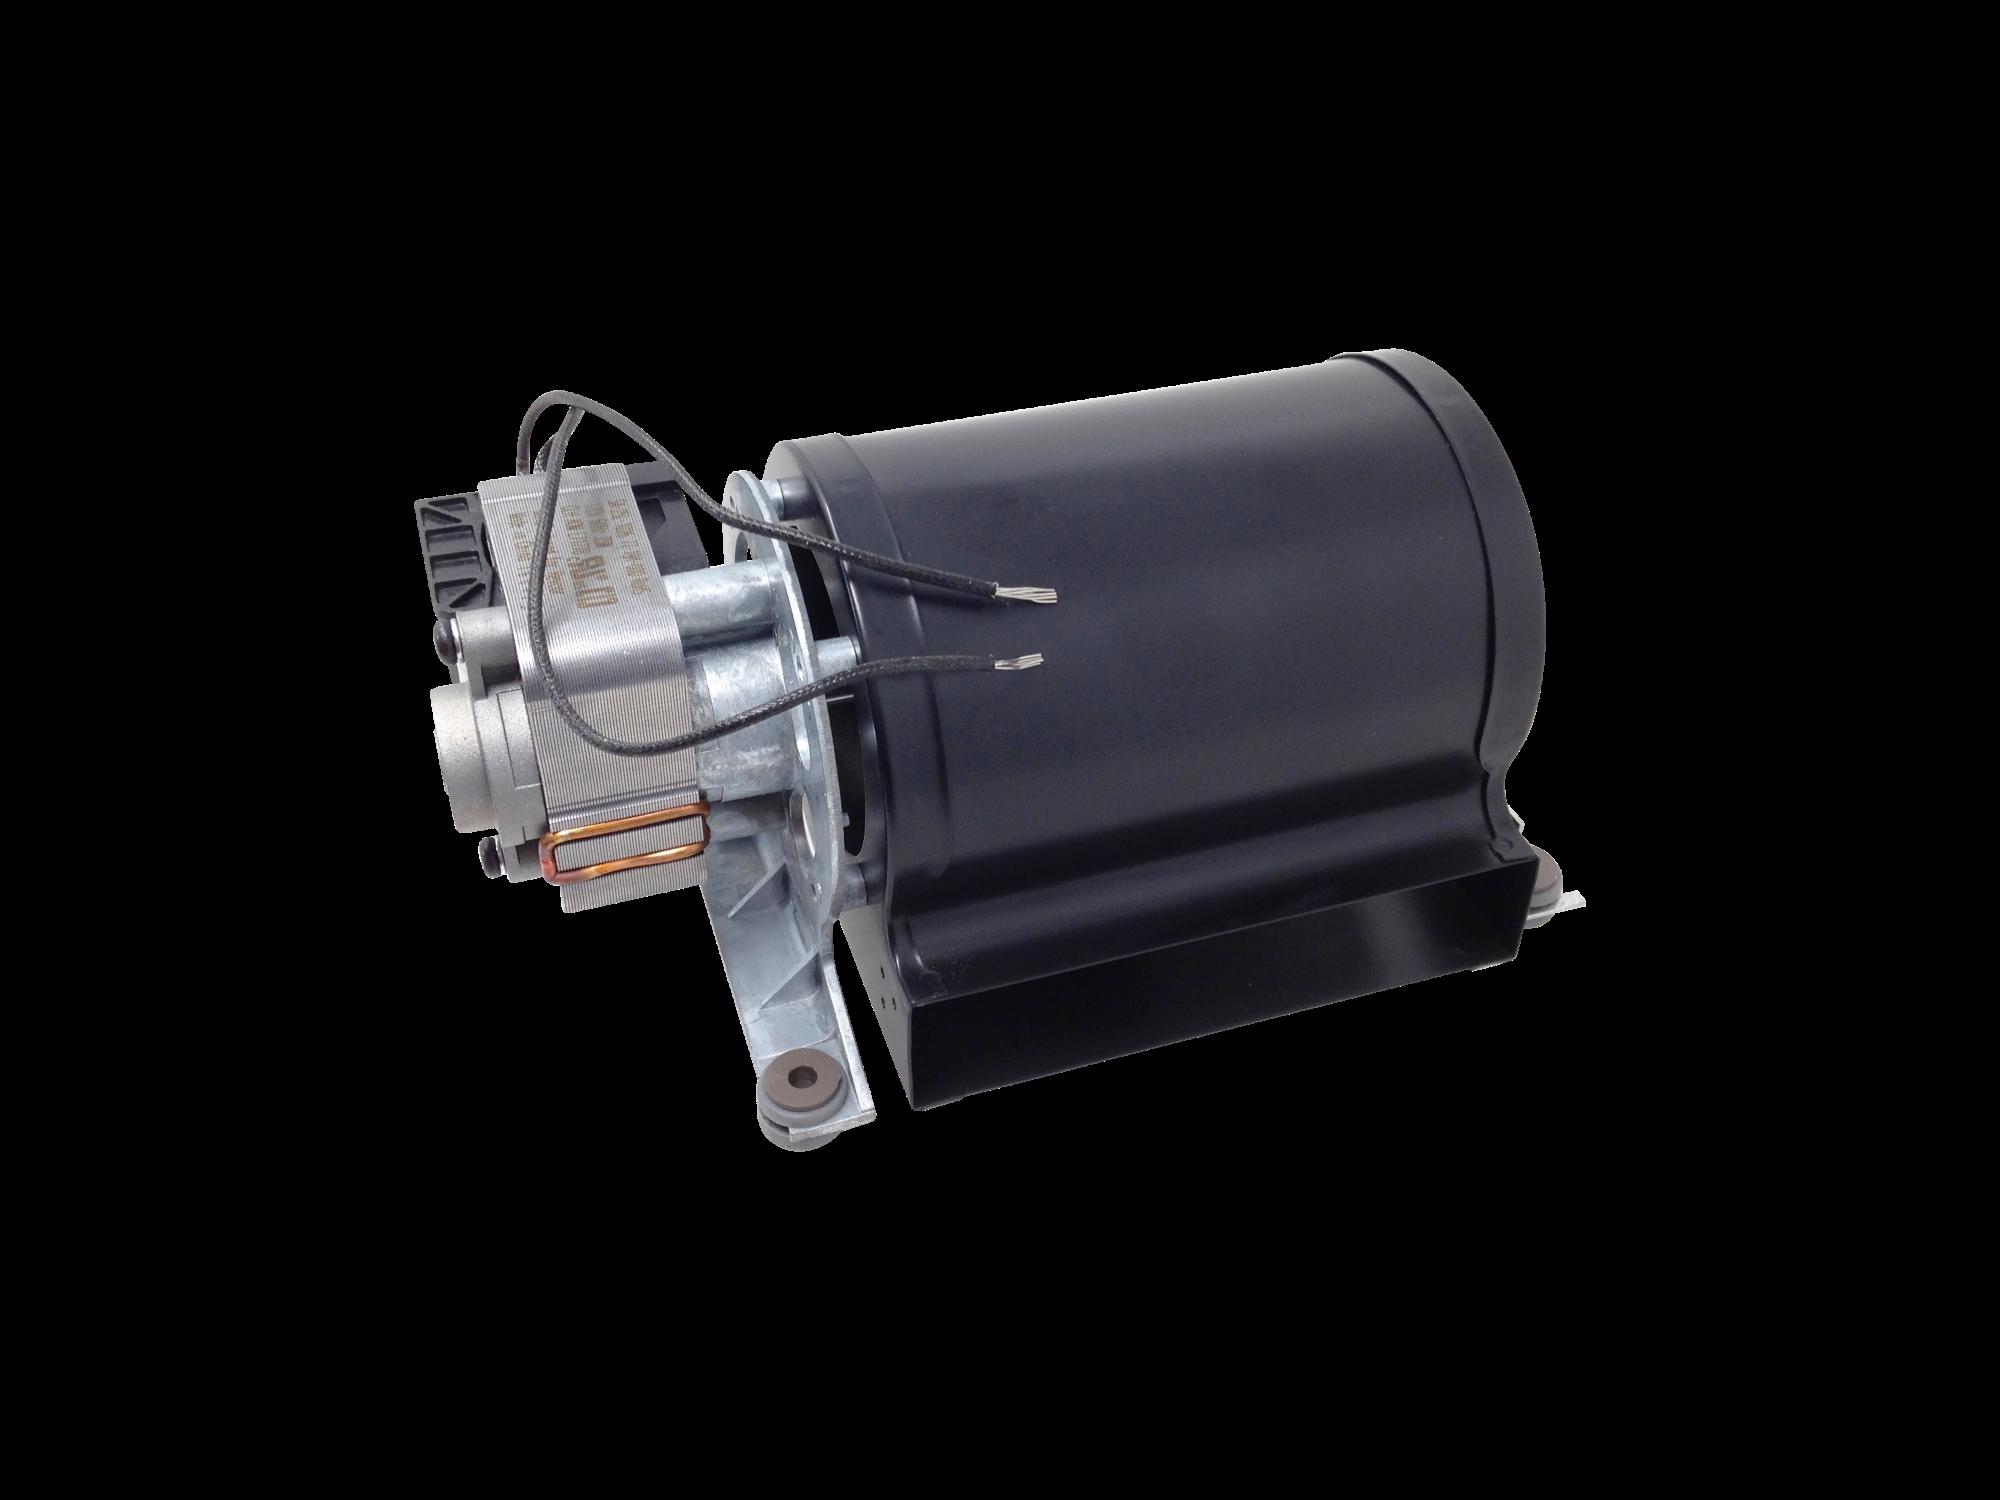 Pacific Energy Insert Blower Motor (5024.54-B), 80000905 | Right-Side